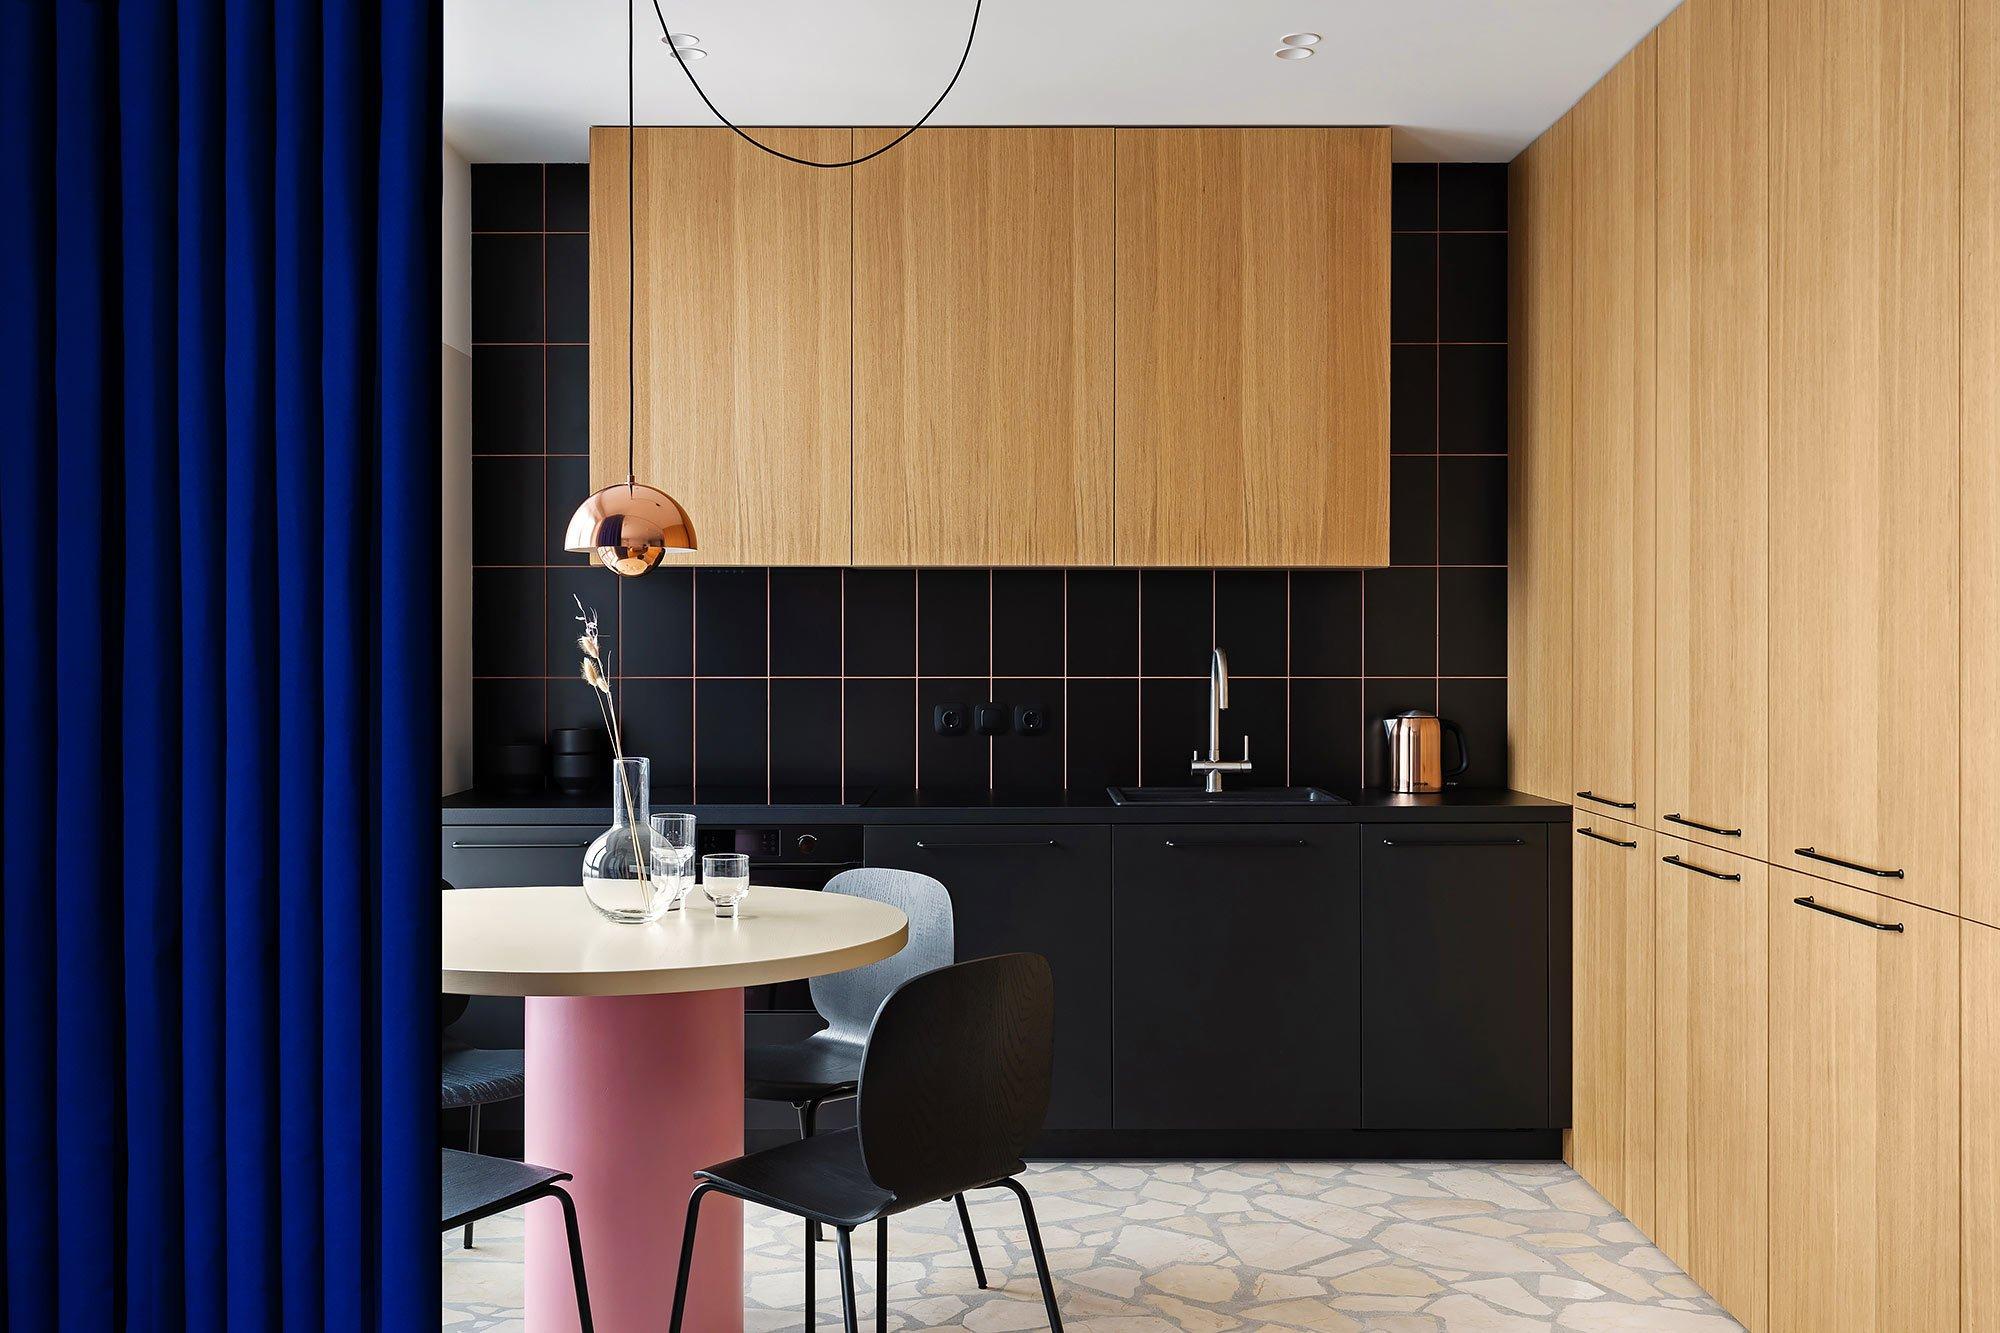 EGR Apartment, ater.architects, Kiew, Foto: Alexey Yanchenkov